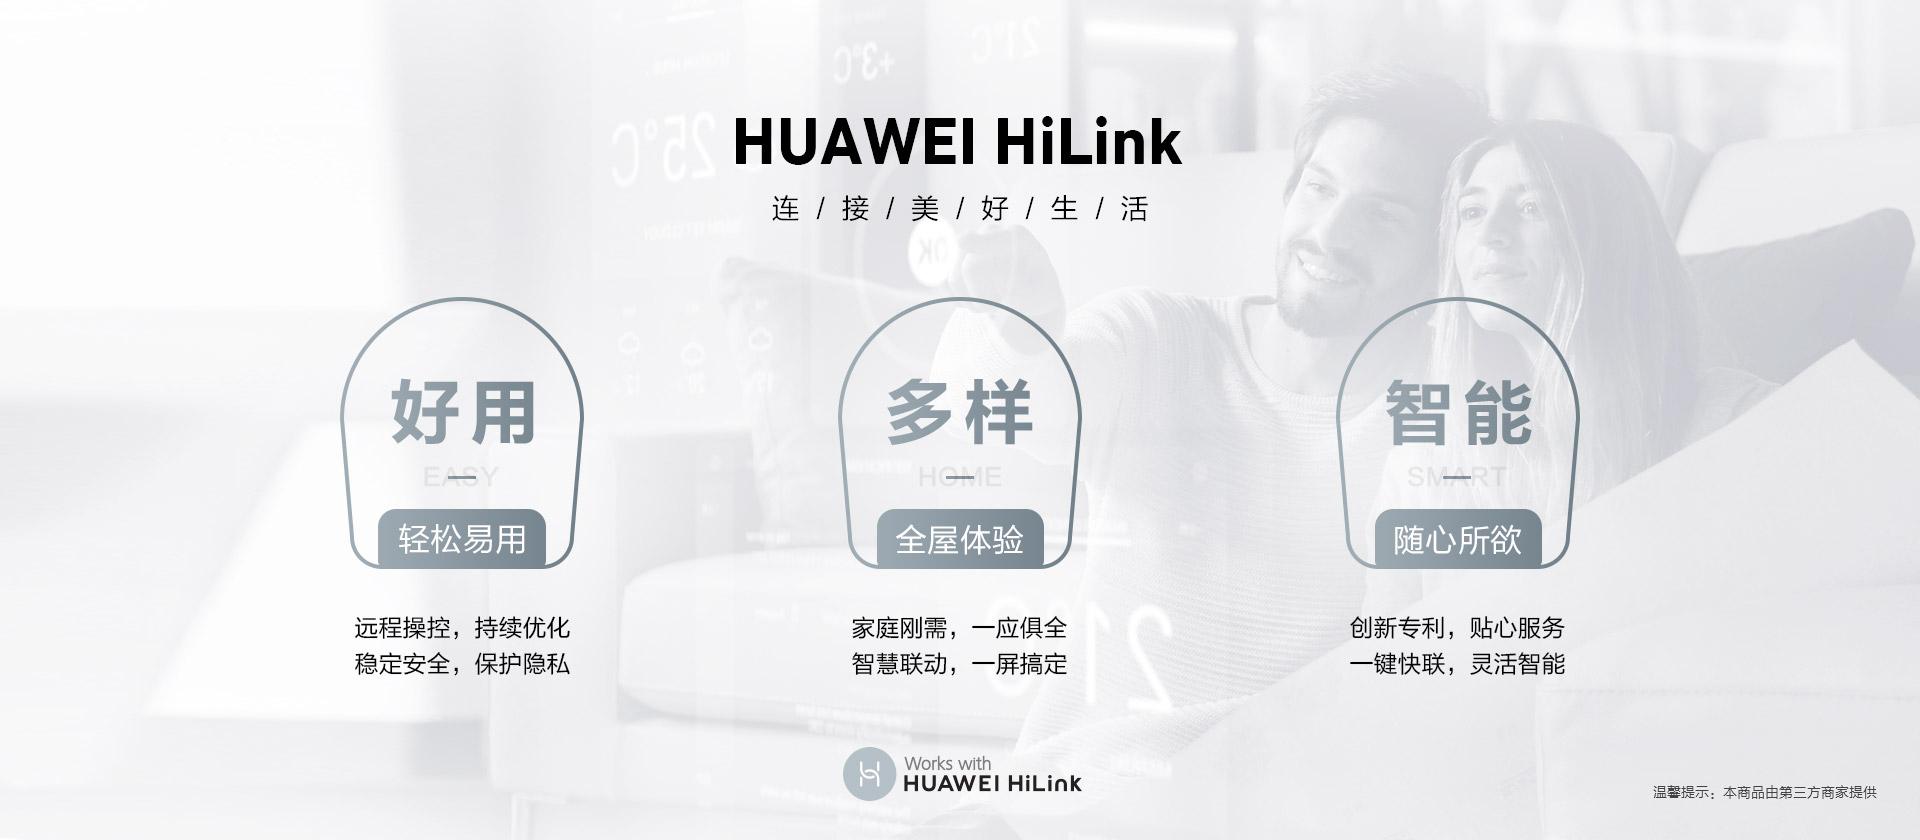 HiLink_pc.jpg